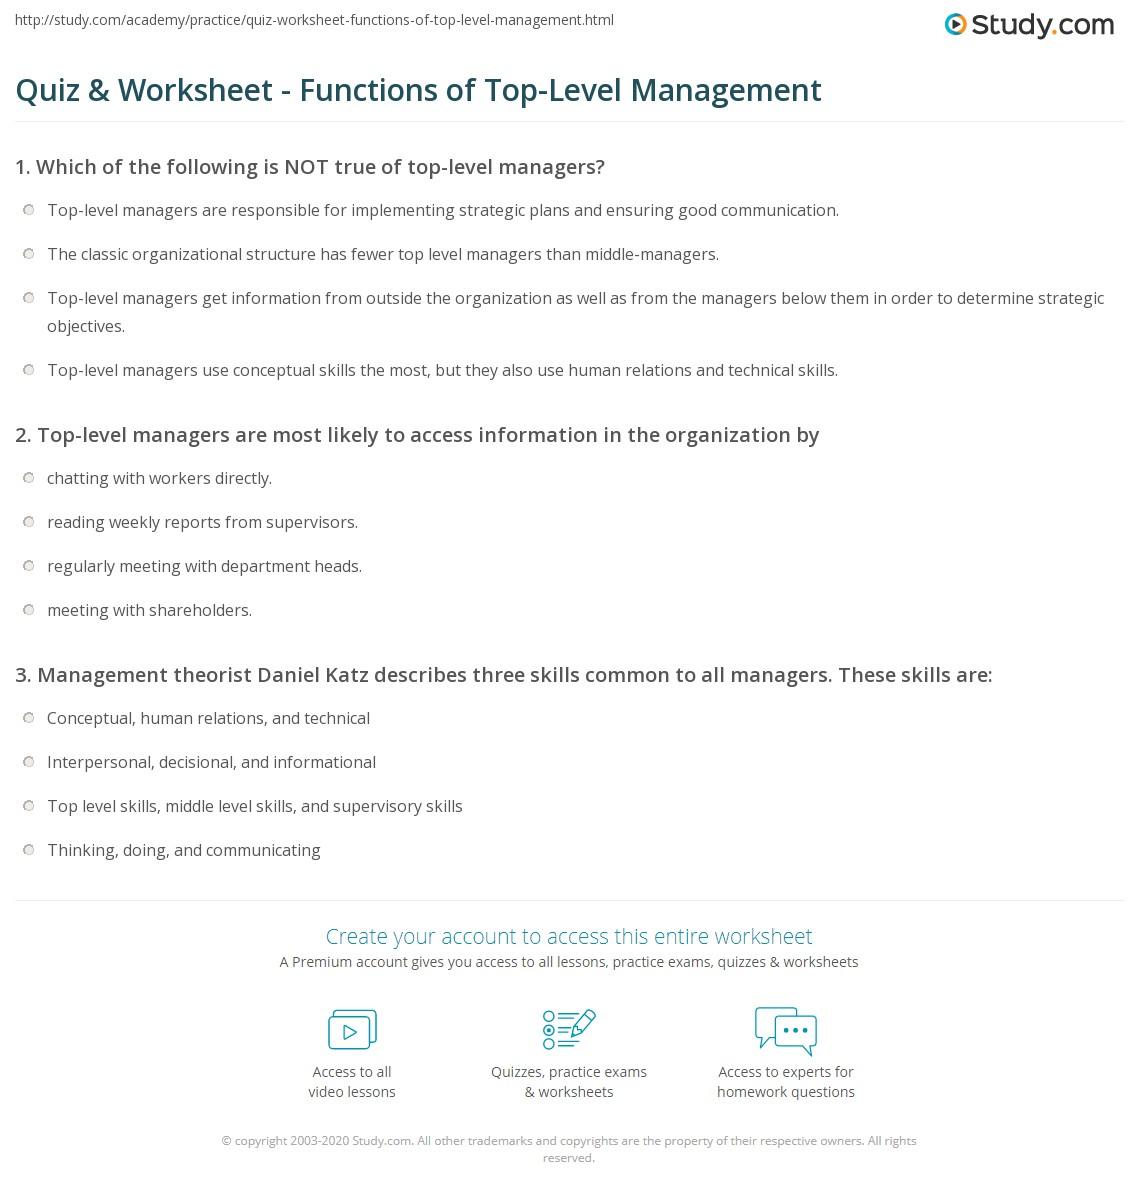 Quiz & Worksheet - Functions of Top-Level Management | Study com